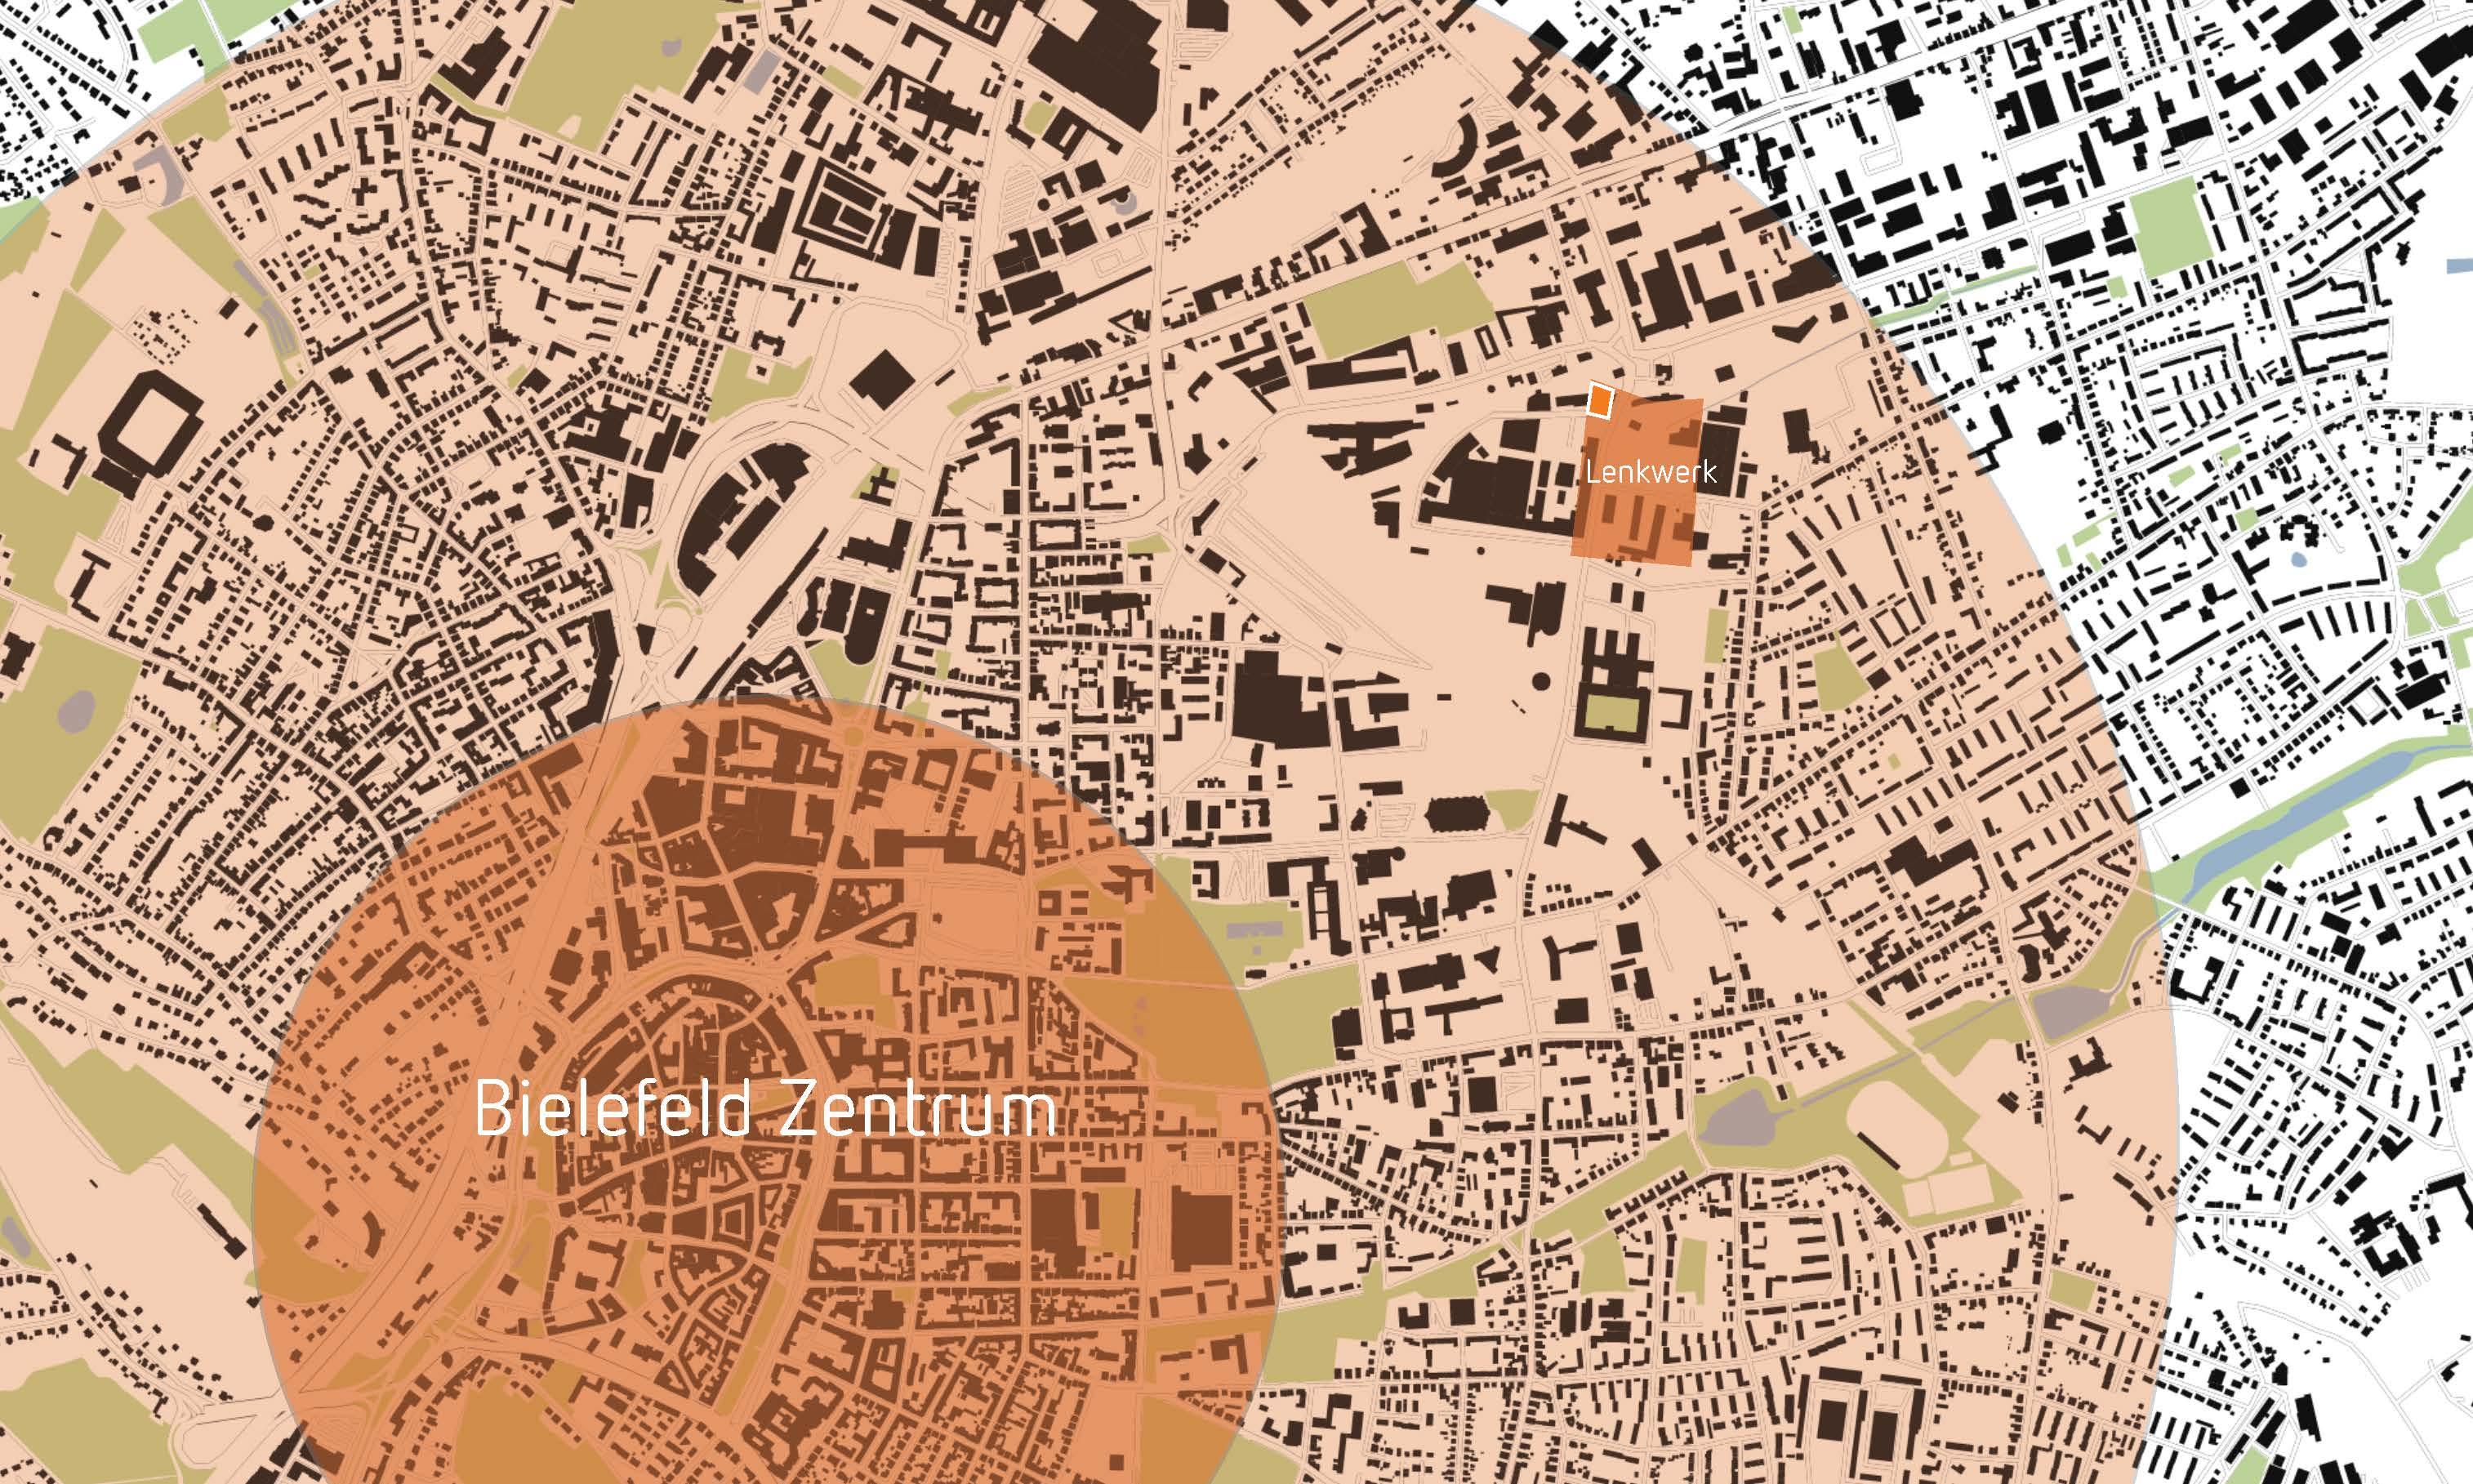 LENKWERK_HAUS Lageplan Stadtgebiet